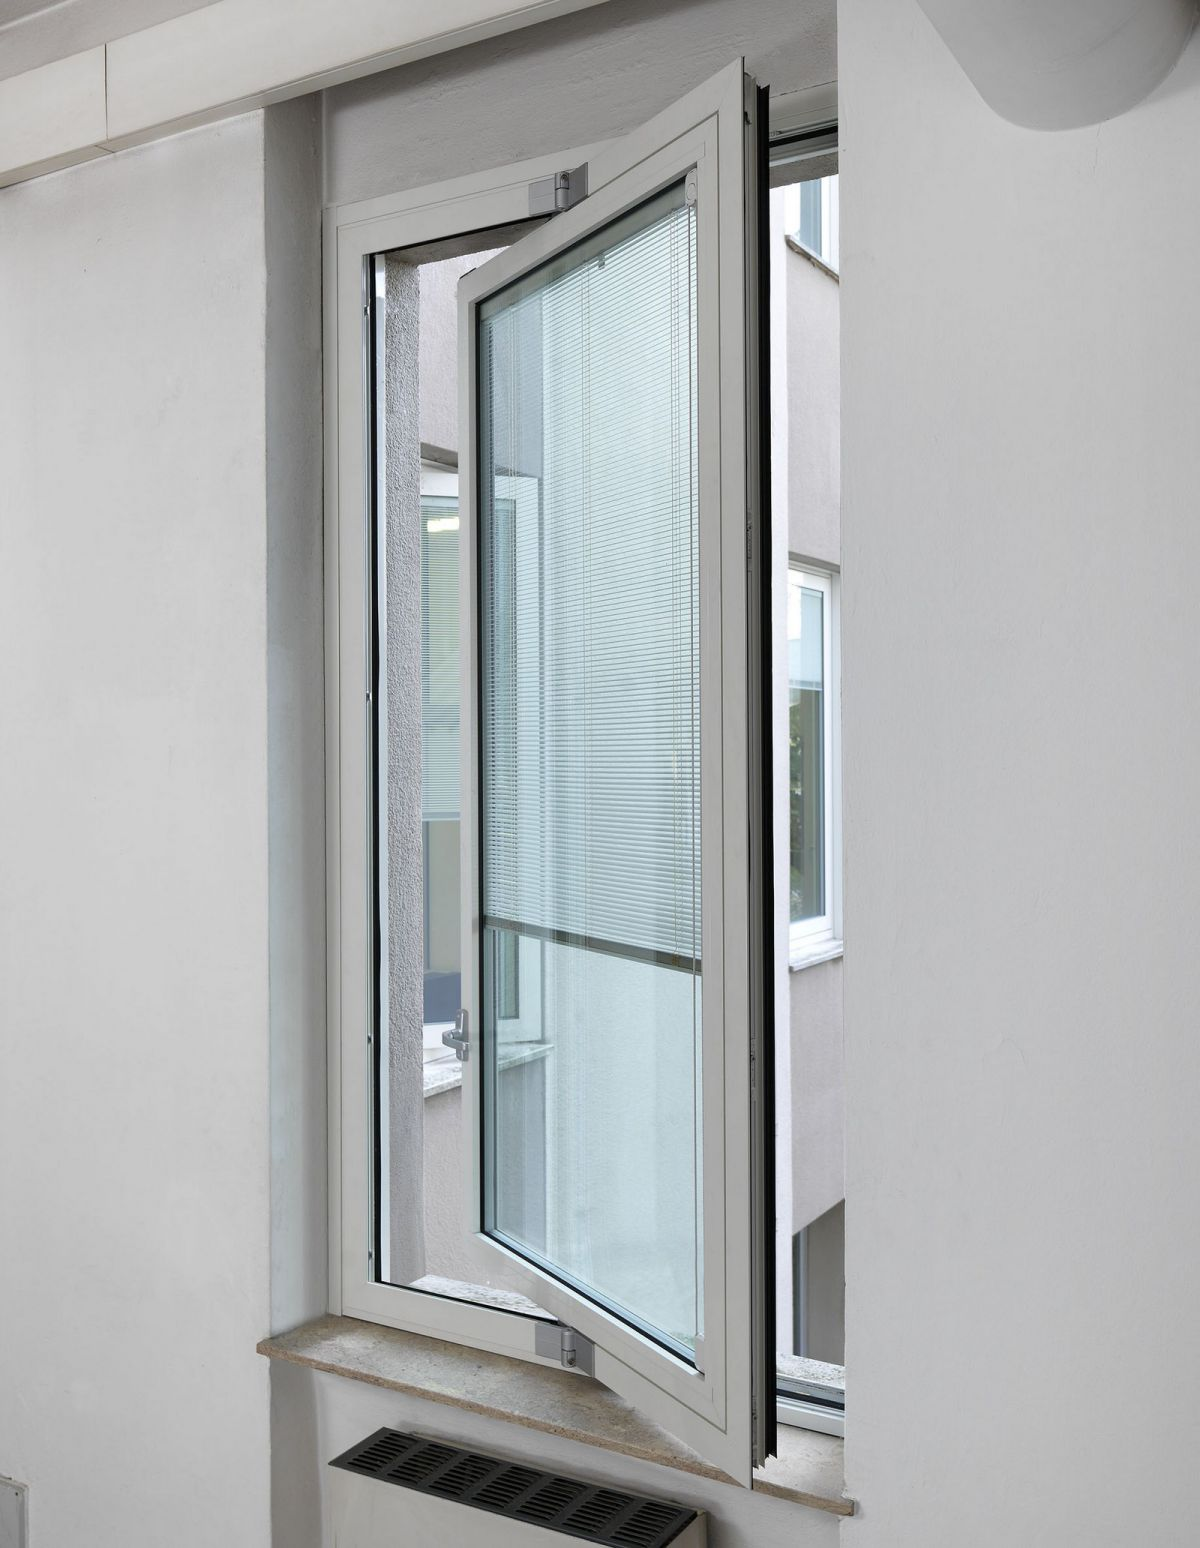 Fossati finestre catalogo fossati pvc with fossati finestre serramenti in pvc fossati alutek - Finestre pvc opinioni ...